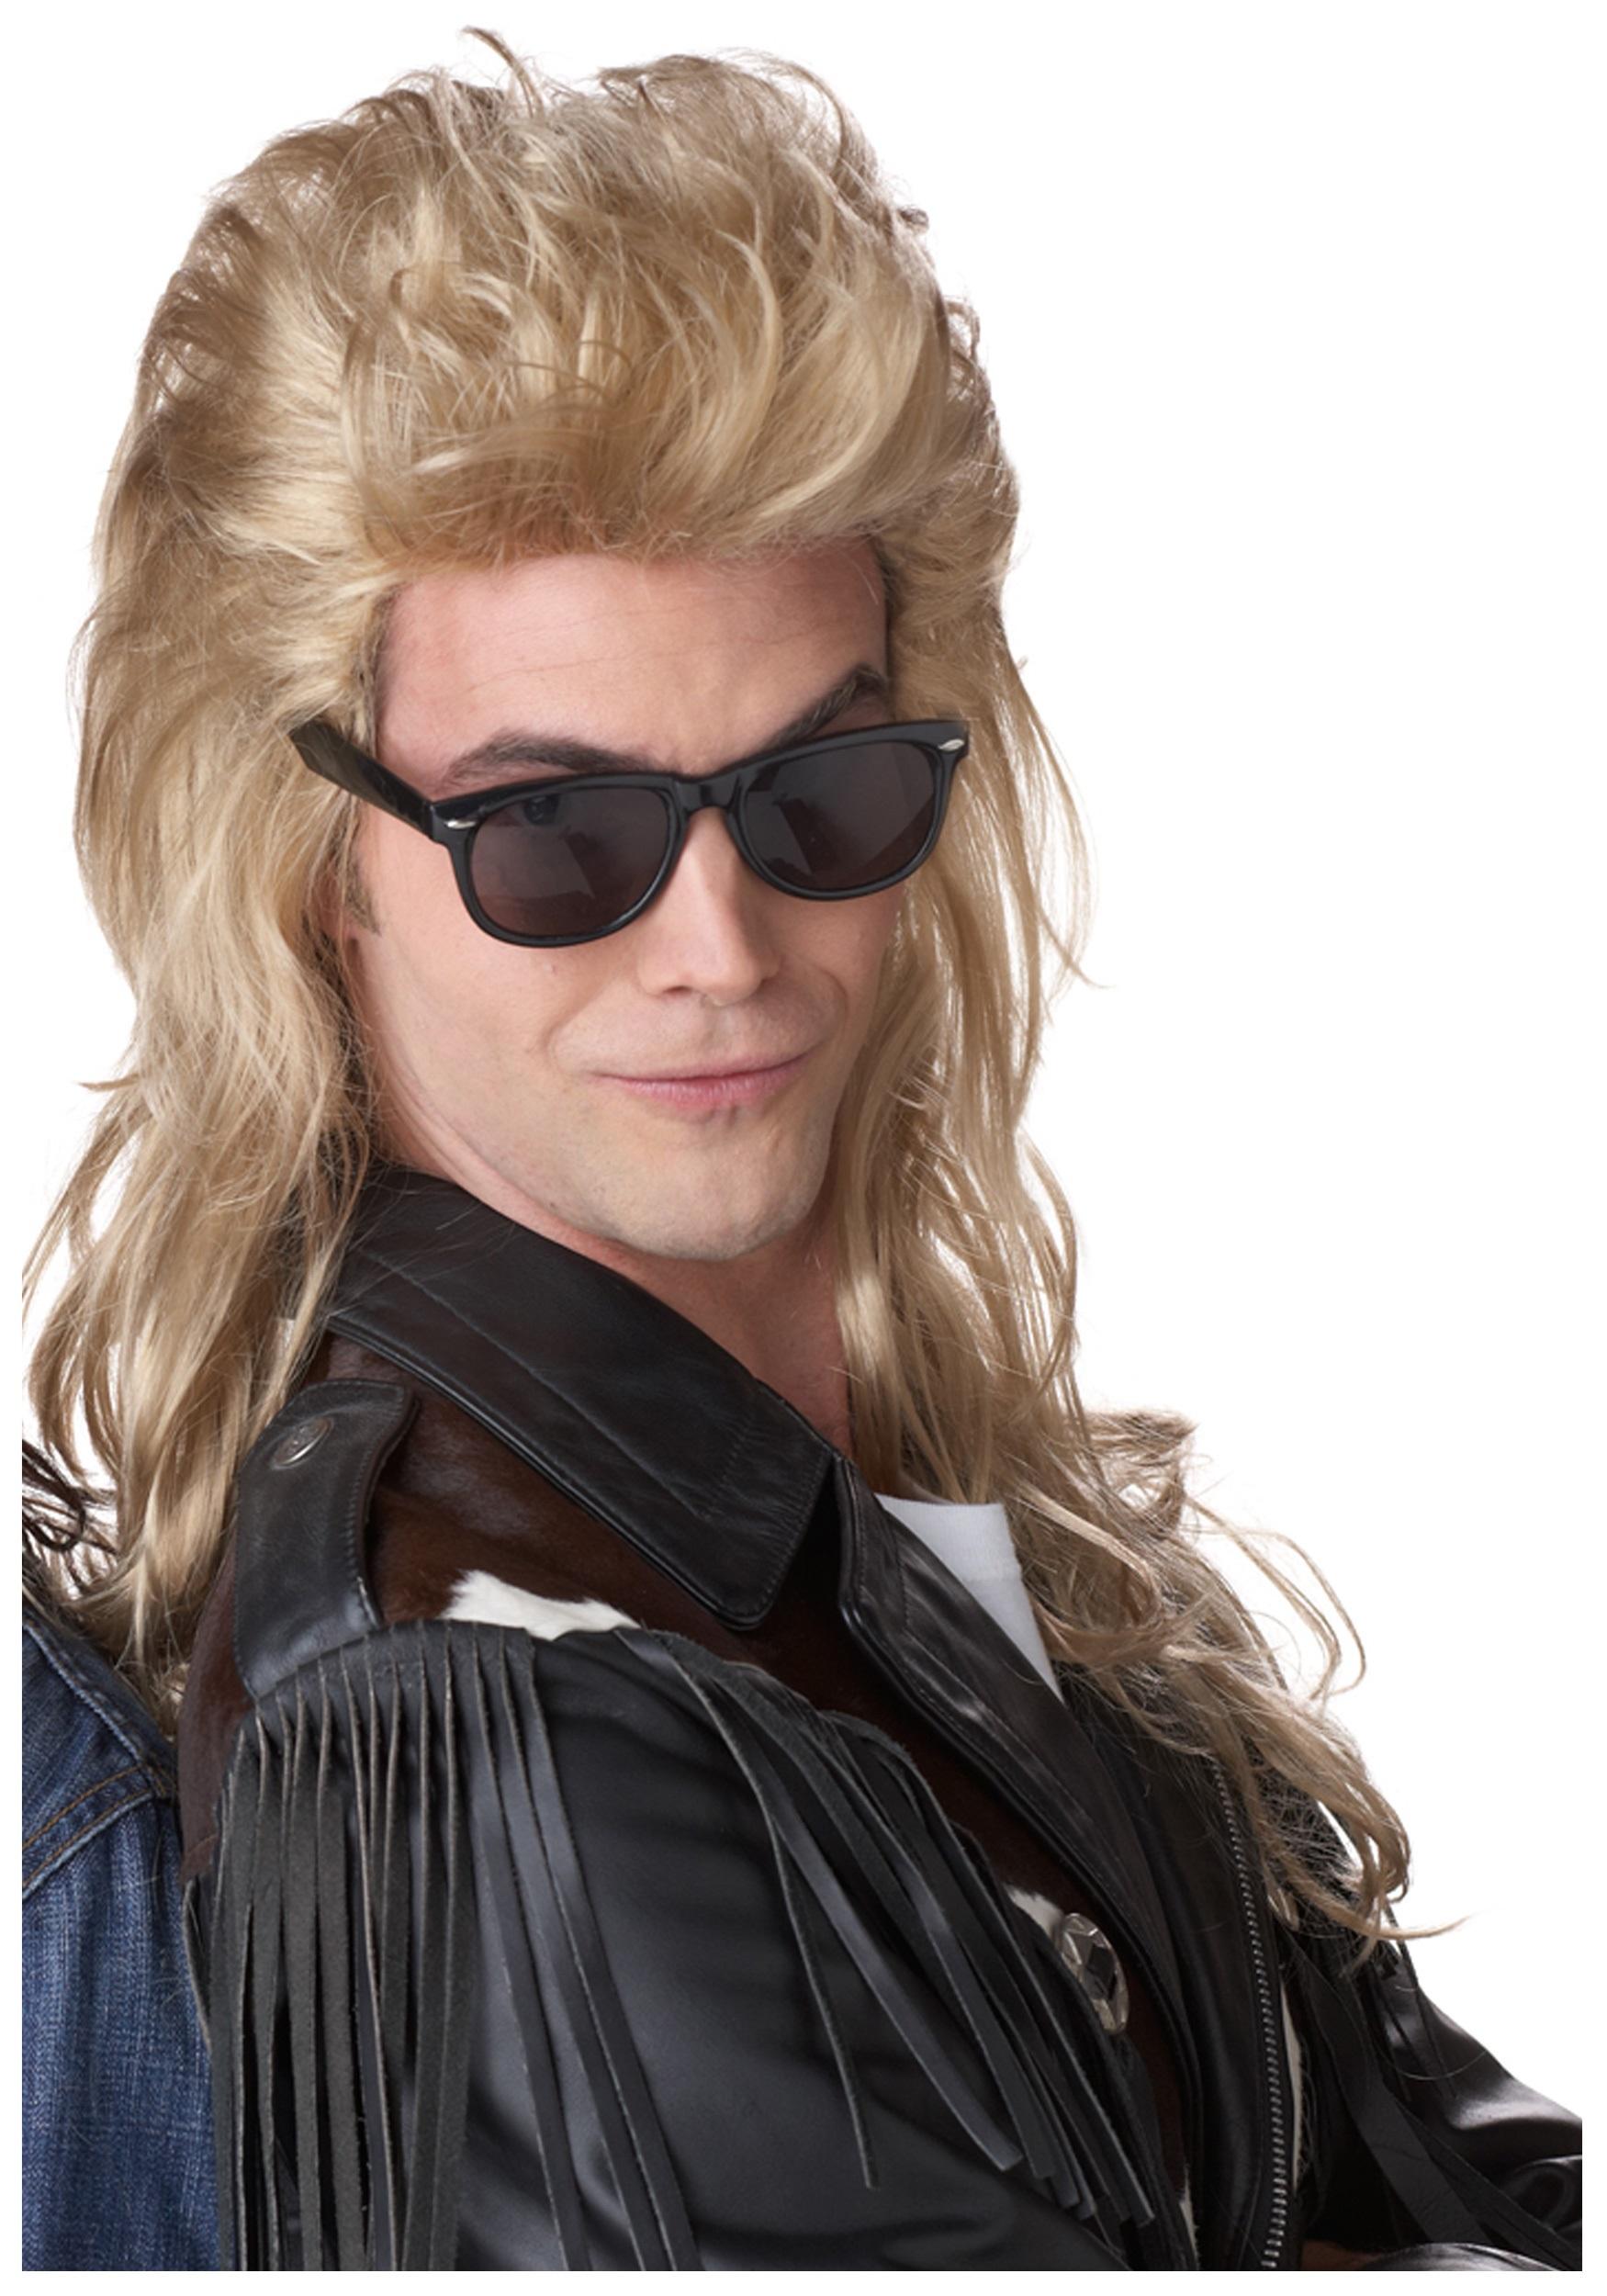 80s Blonde Rock Mullet Wig - 1980s Costume Accessories 020c3733b